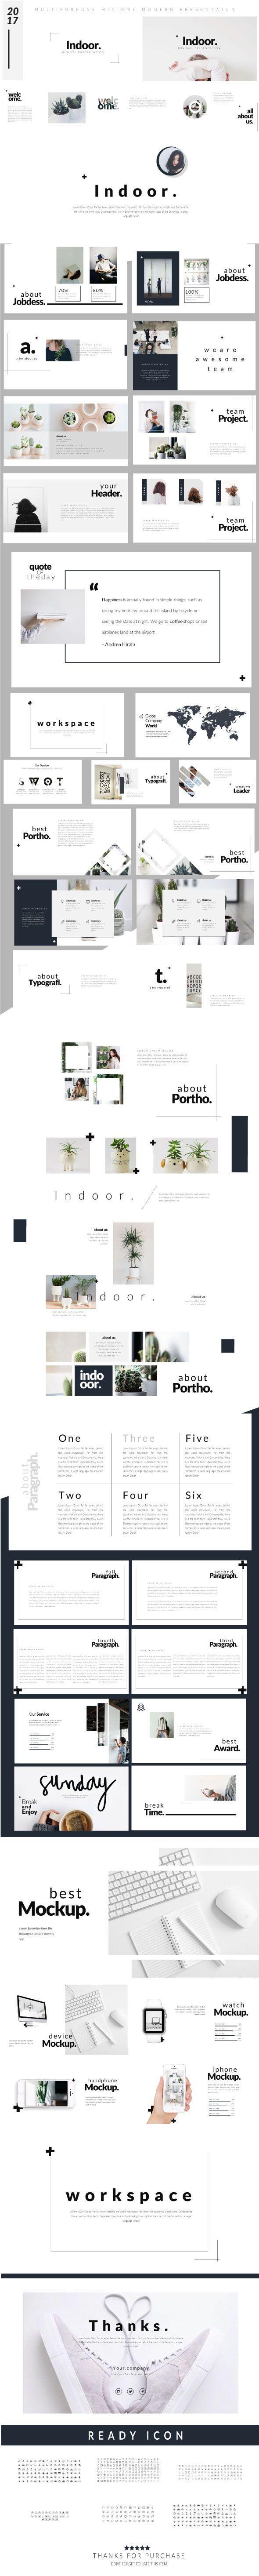 indoor - modern minimal presentation template | business, Presentation templates